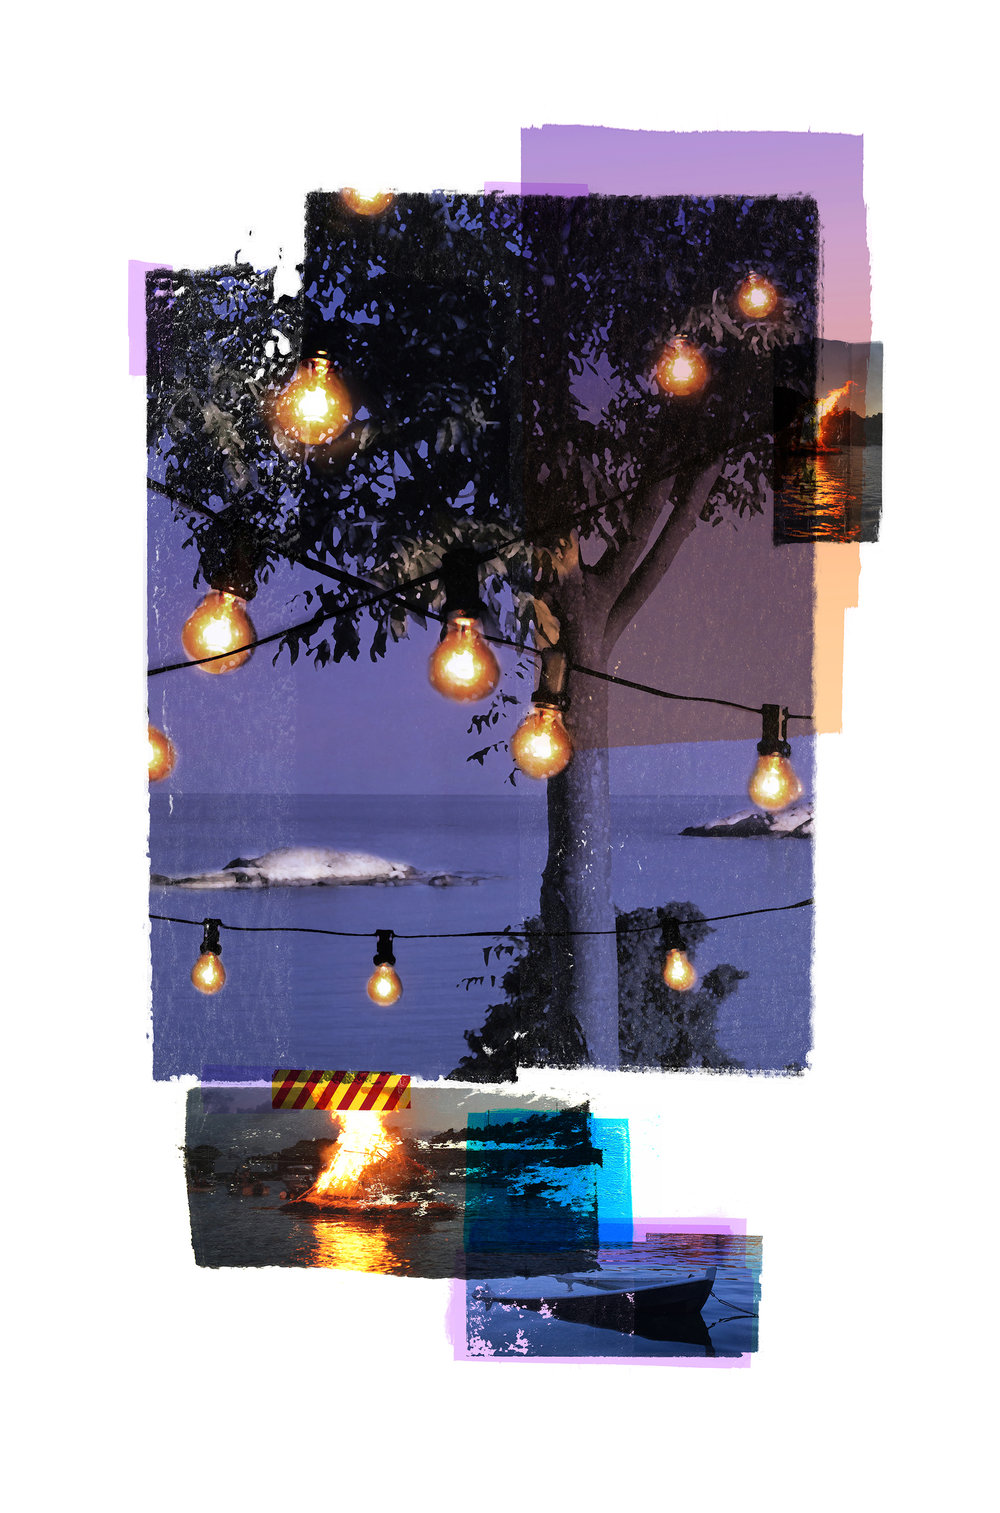 Rim of the party (Sunken boat) / Olsok / NYH  Photolitho/ IDEM PARIS BFK Rives 250 gr, Handcut 38 x 58 cm / 15 x 22,8 in Edition of 100 +15 Ap Editeur: IDEM PARIS / Per Fronth  14/2017: